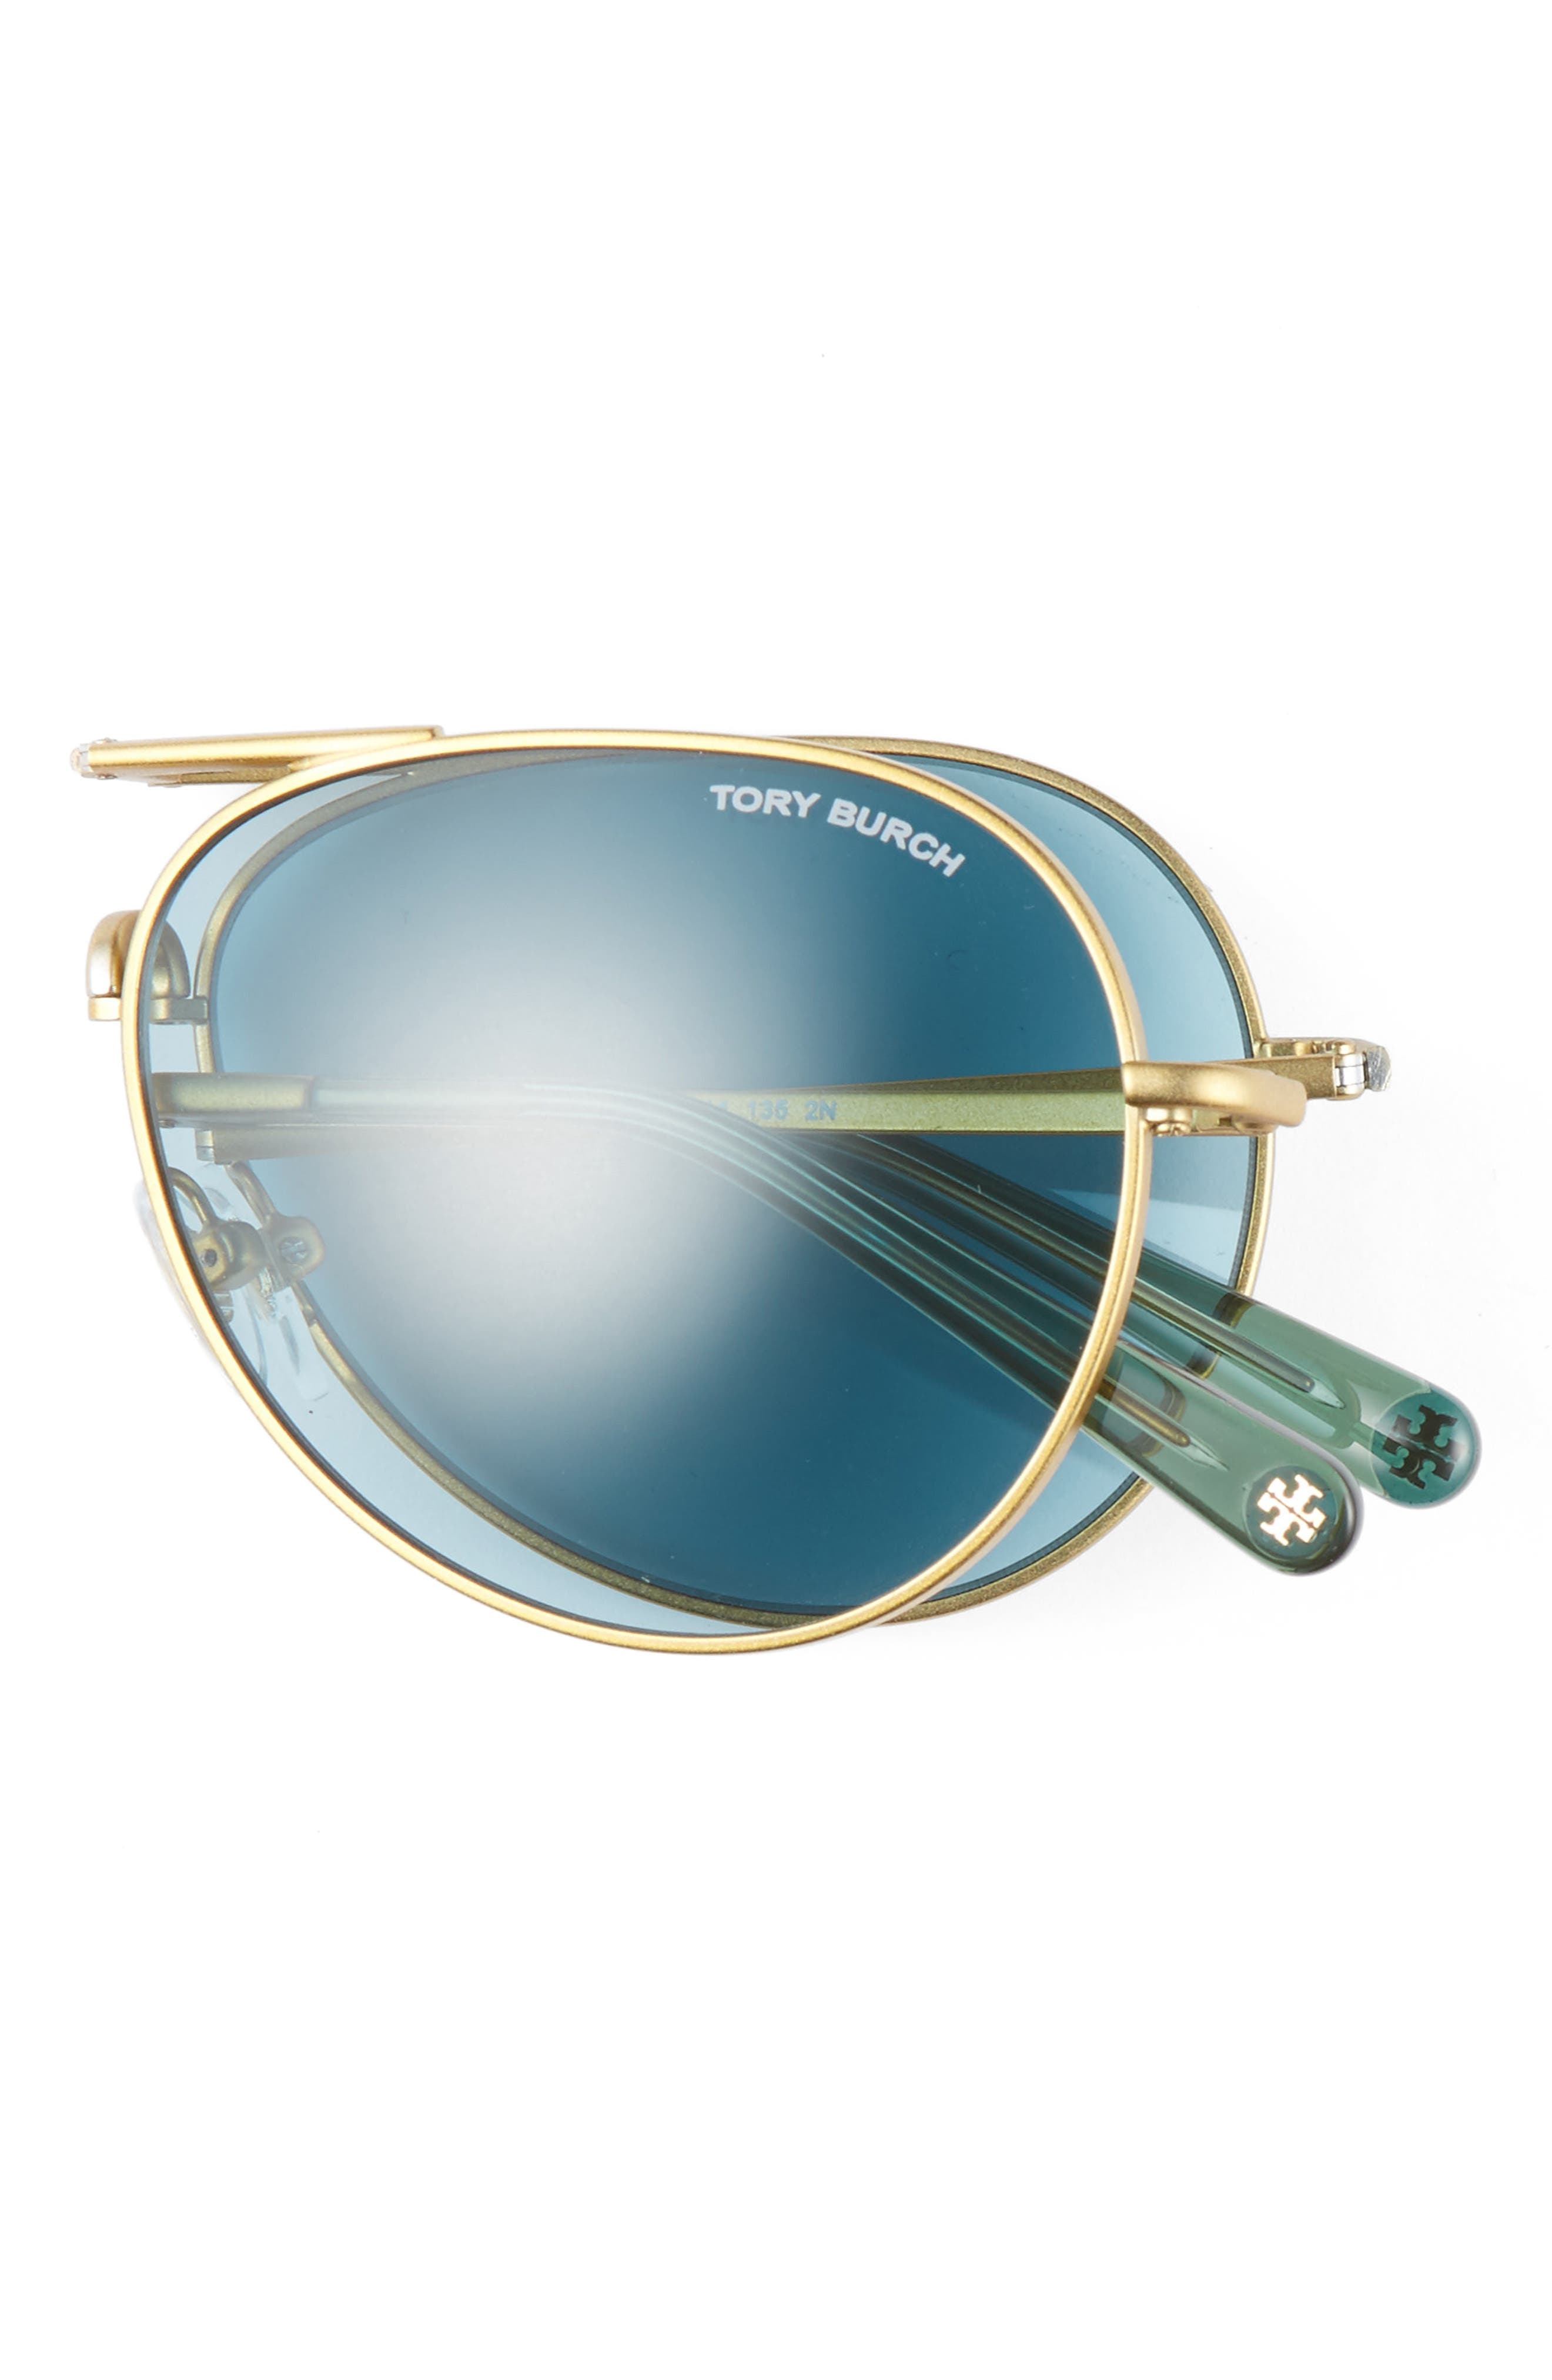 58mm Foldable Aviator Sunglasses,                             Alternate thumbnail 3, color,                             710